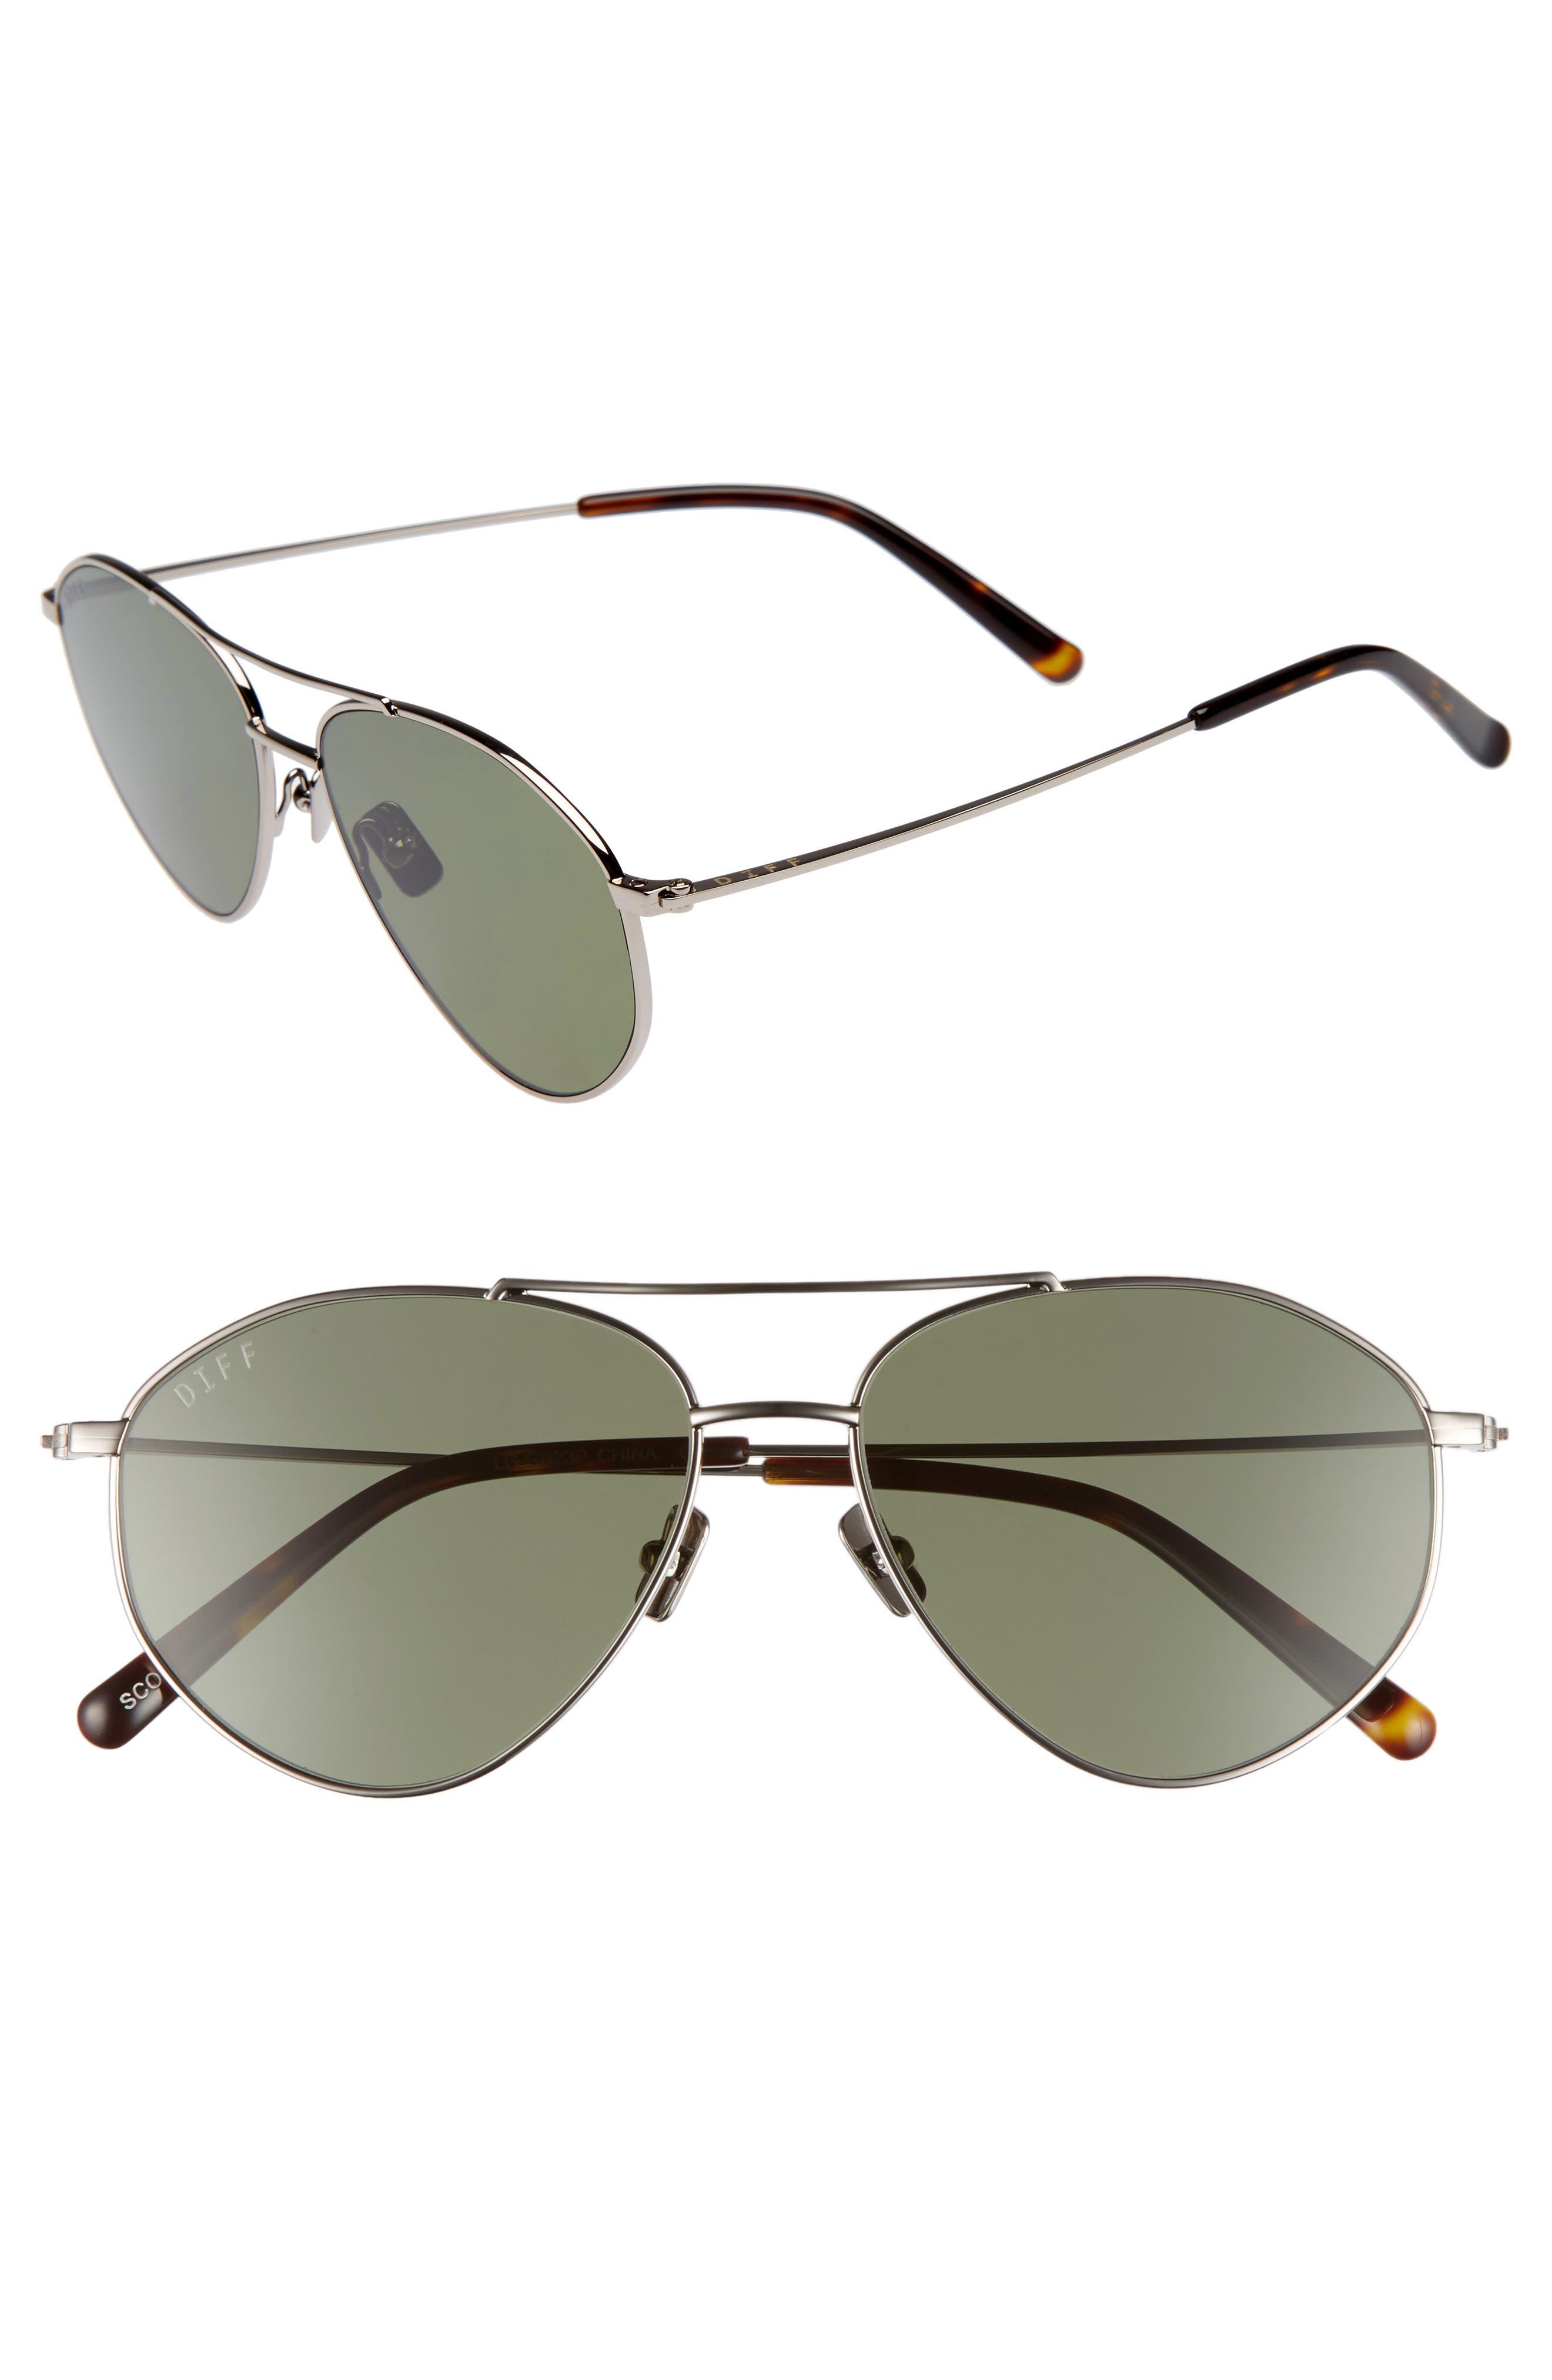 Scout 53mm Aviator Sunglasses,                             Main thumbnail 1, color,                             Light Gunmetal/ Green